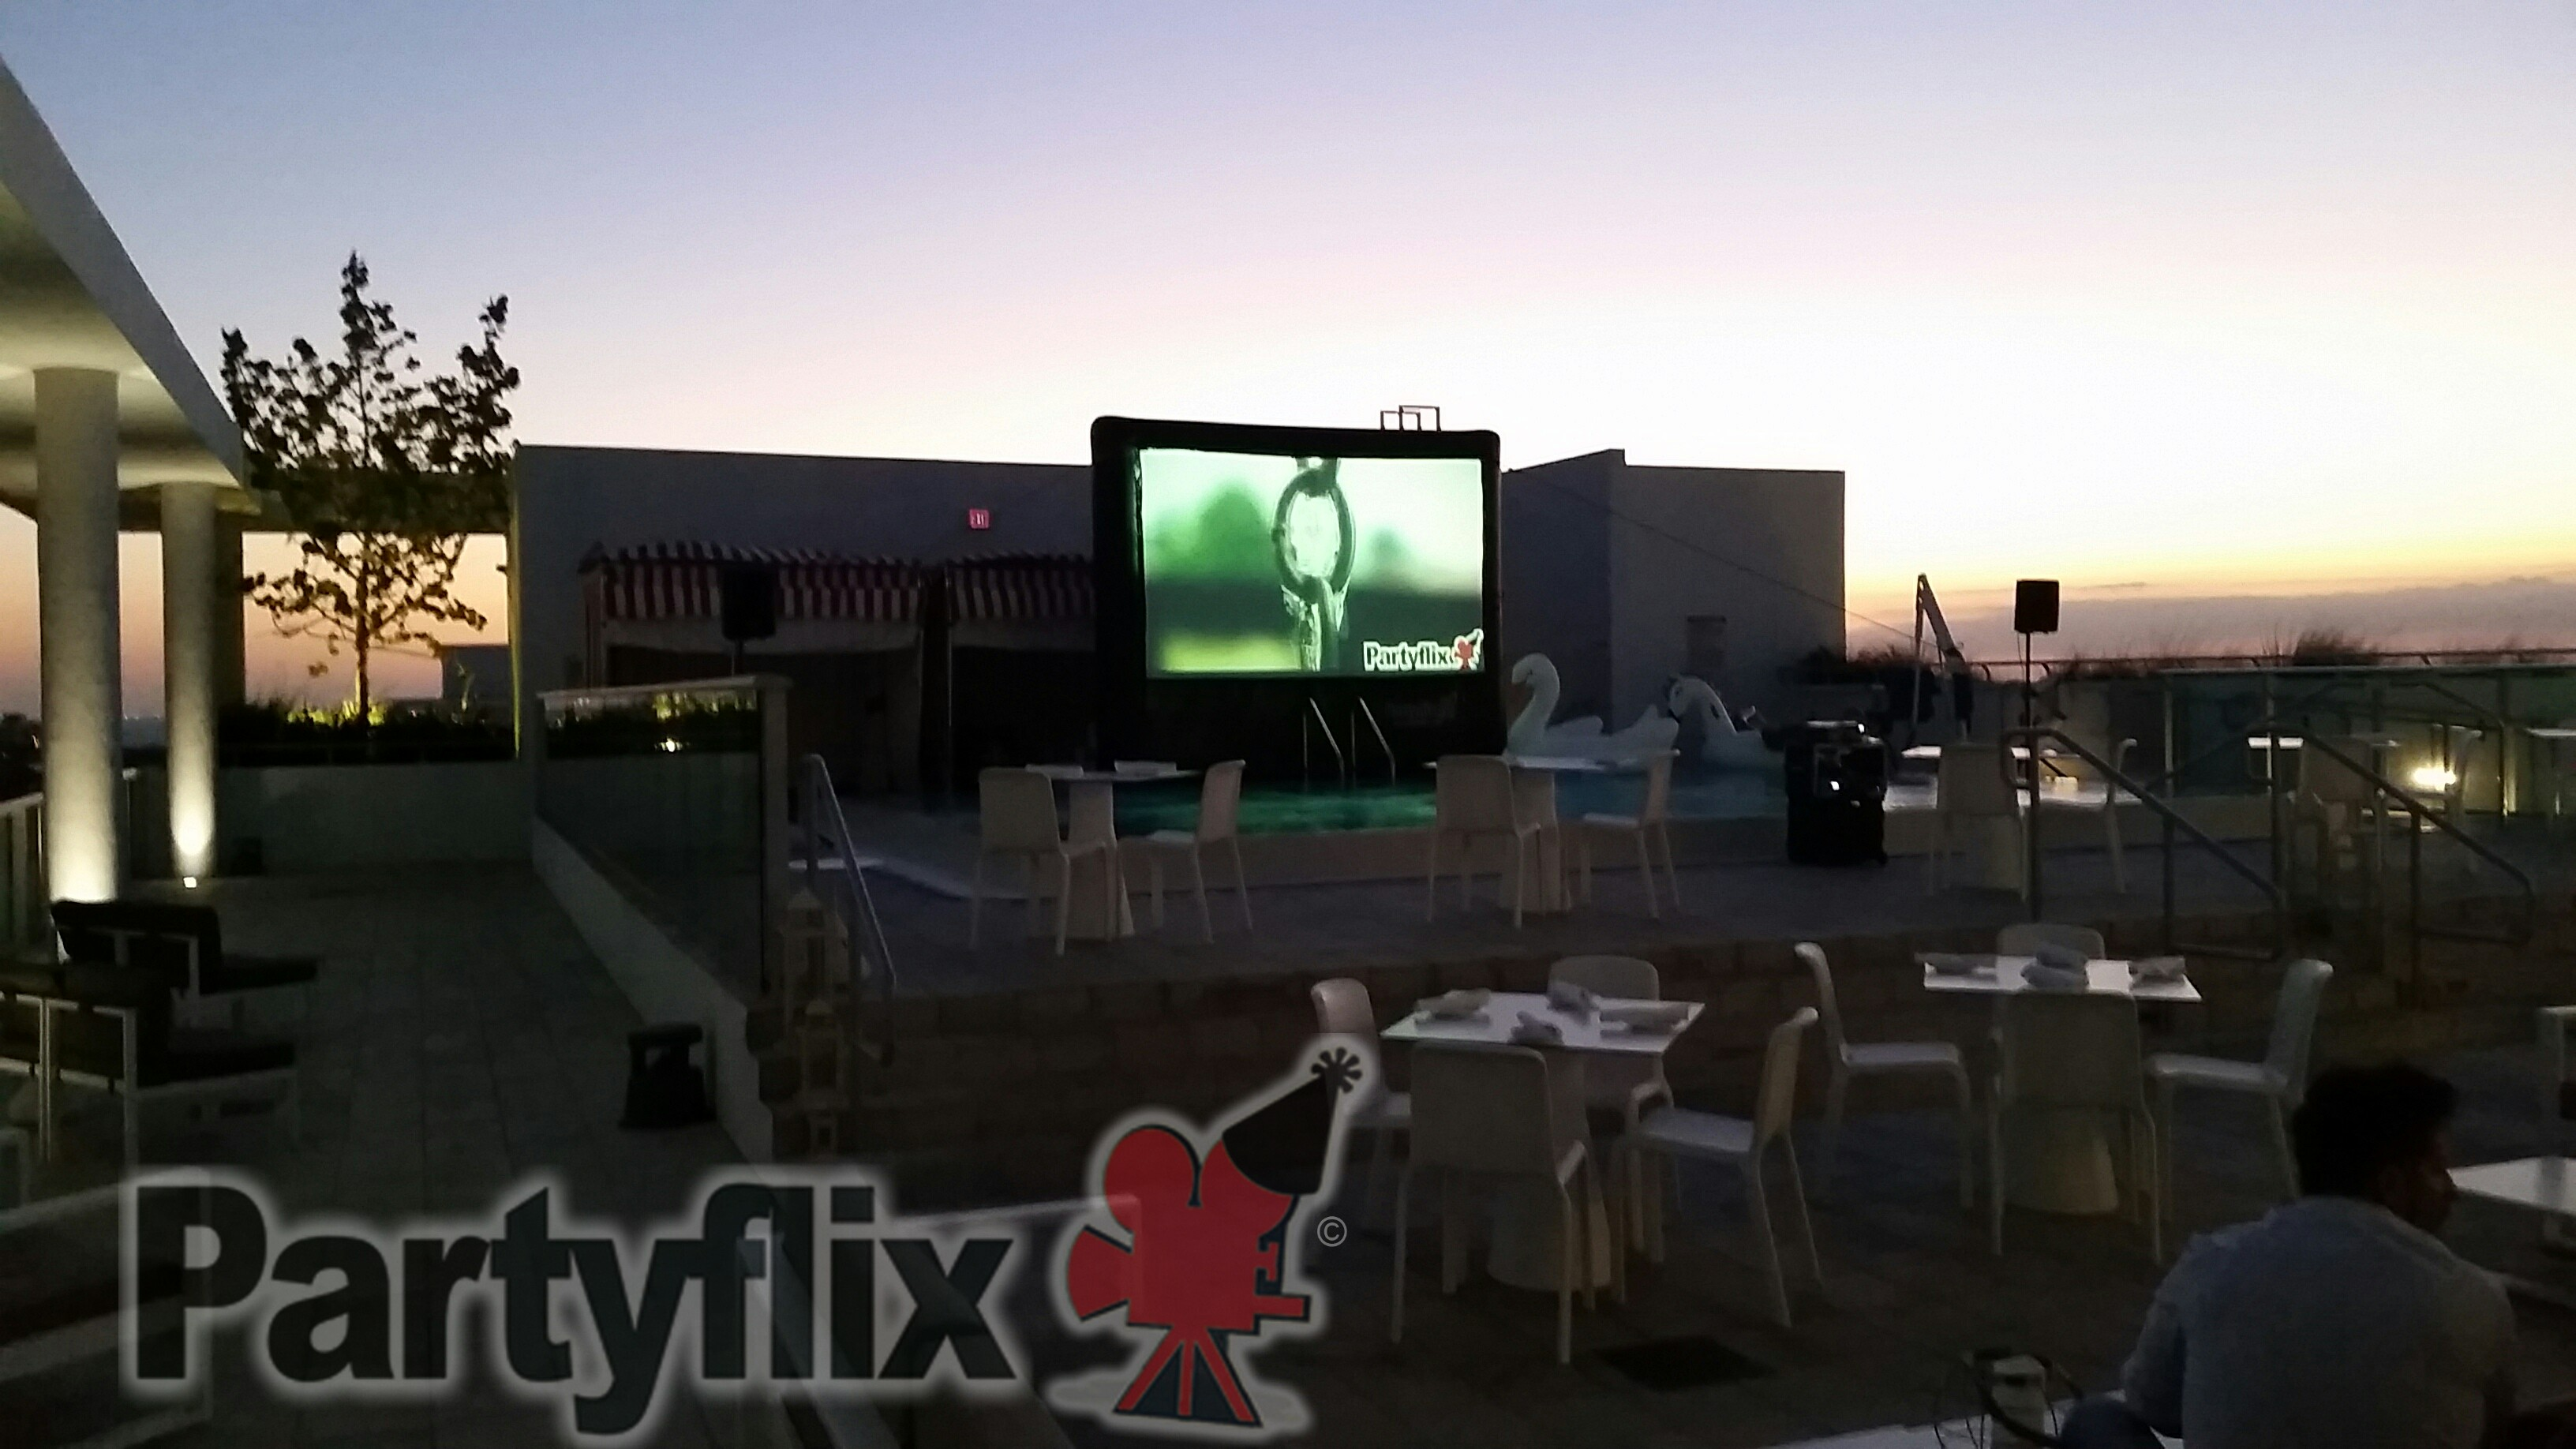 18ft Inflatable Movie Screen Rental in San Antonio